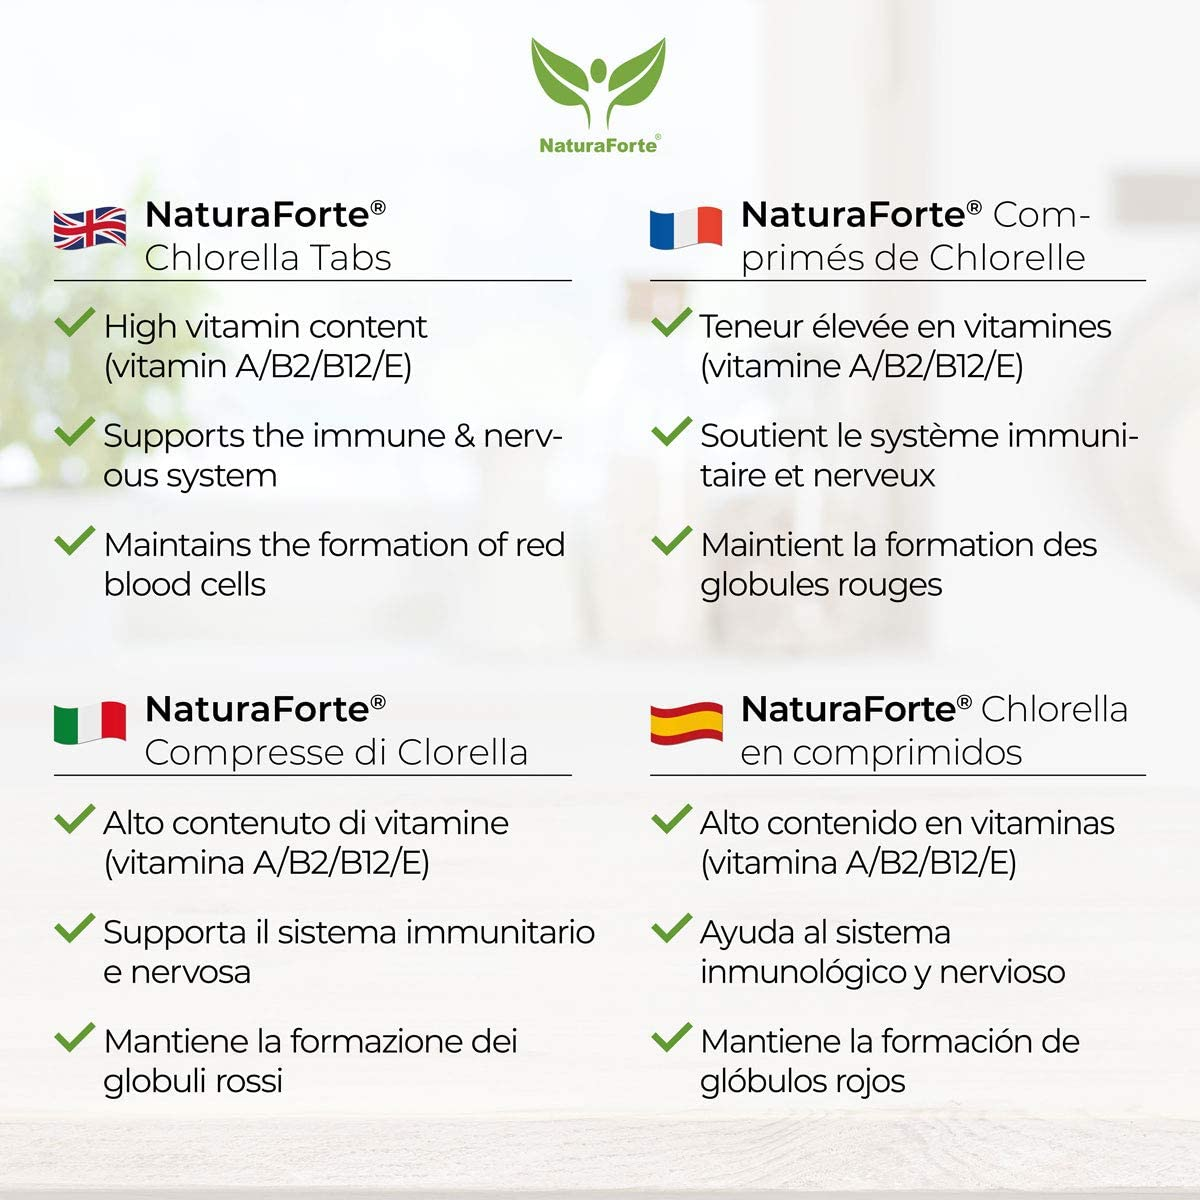 NaturaForte Chlorella 600 Comprimidos de 250mg - 100% pura. Algas Chlorella Vulgaris sin aditivos, con clorofila, vitamina A / B2 / E. Preparado a ...